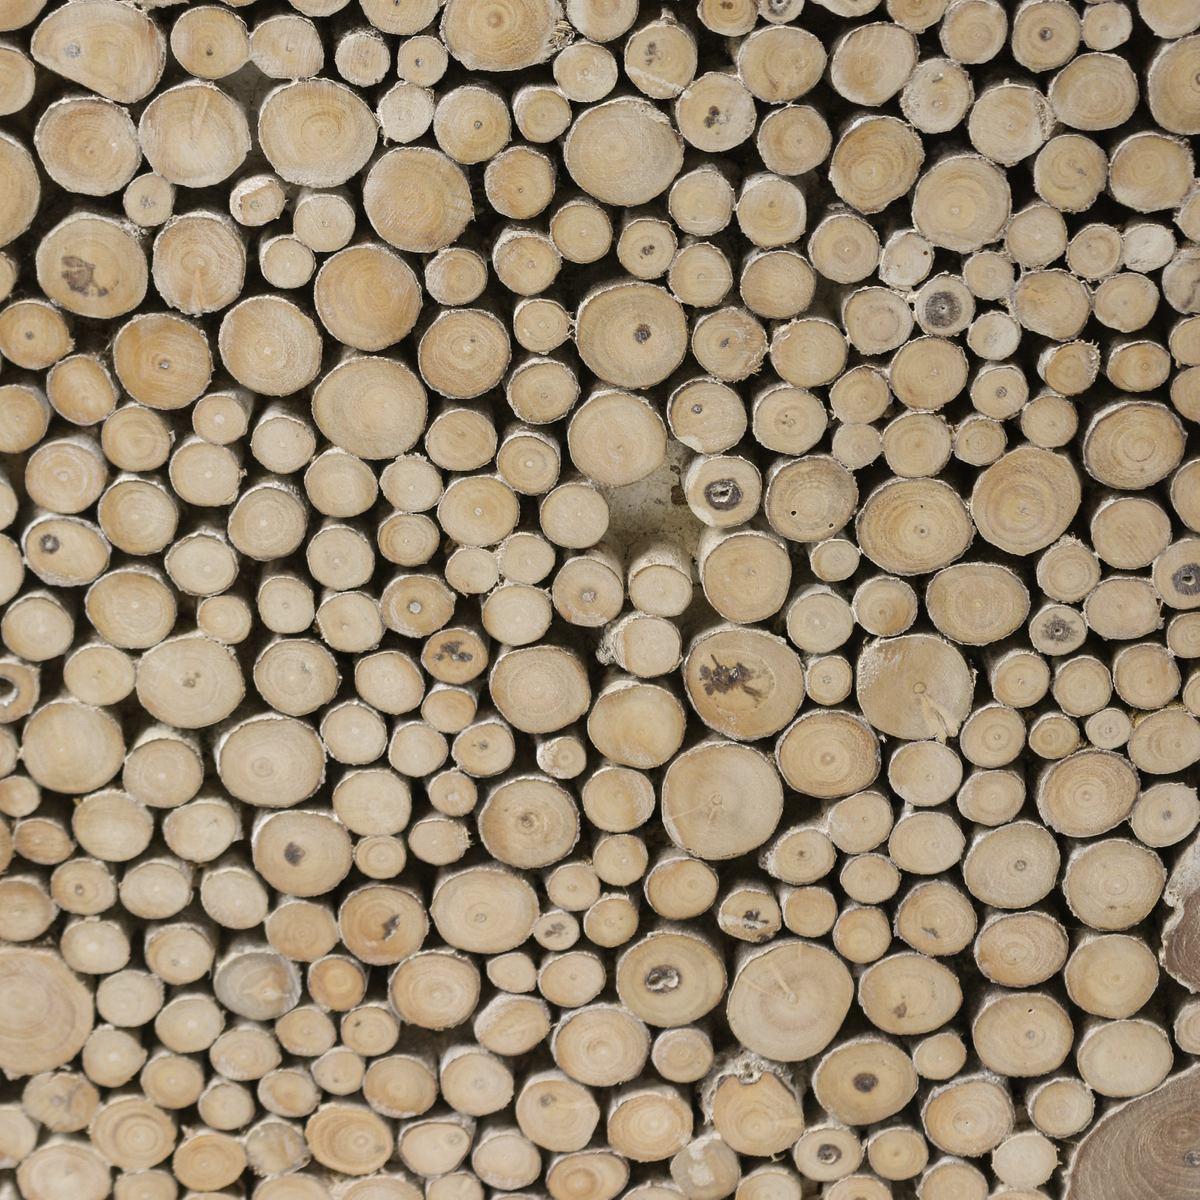 hocker massiv teakholz natur stuhl wurzel block holz klotz konisch natur 40x40cm m bel hocker. Black Bedroom Furniture Sets. Home Design Ideas